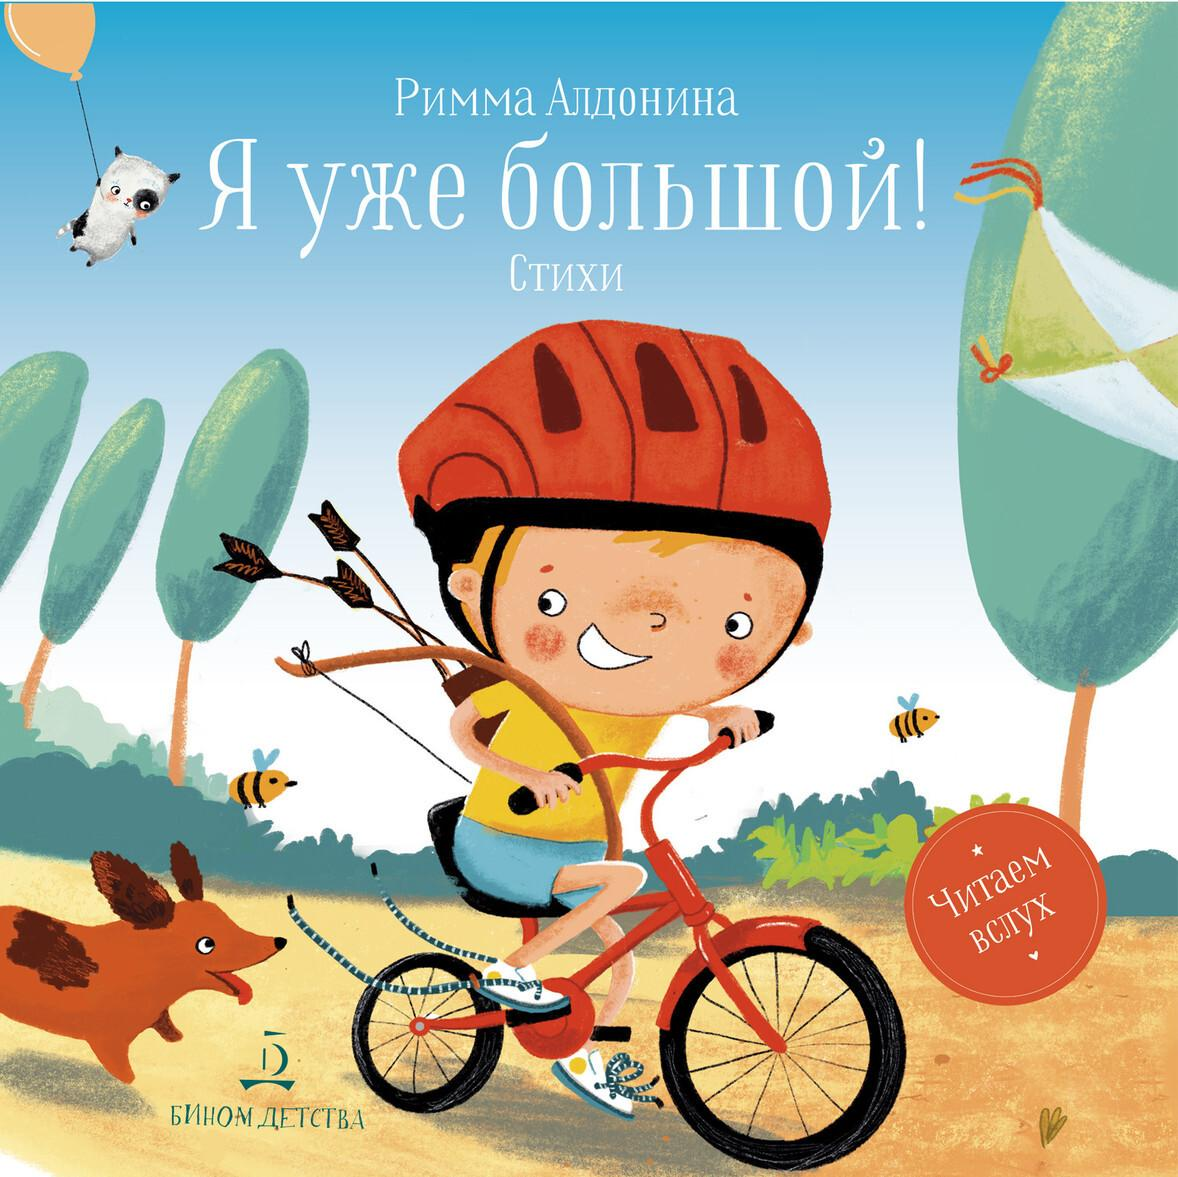 Ja uzhe bolshoj! Stikhi | Aldonina Rimma Petrovna